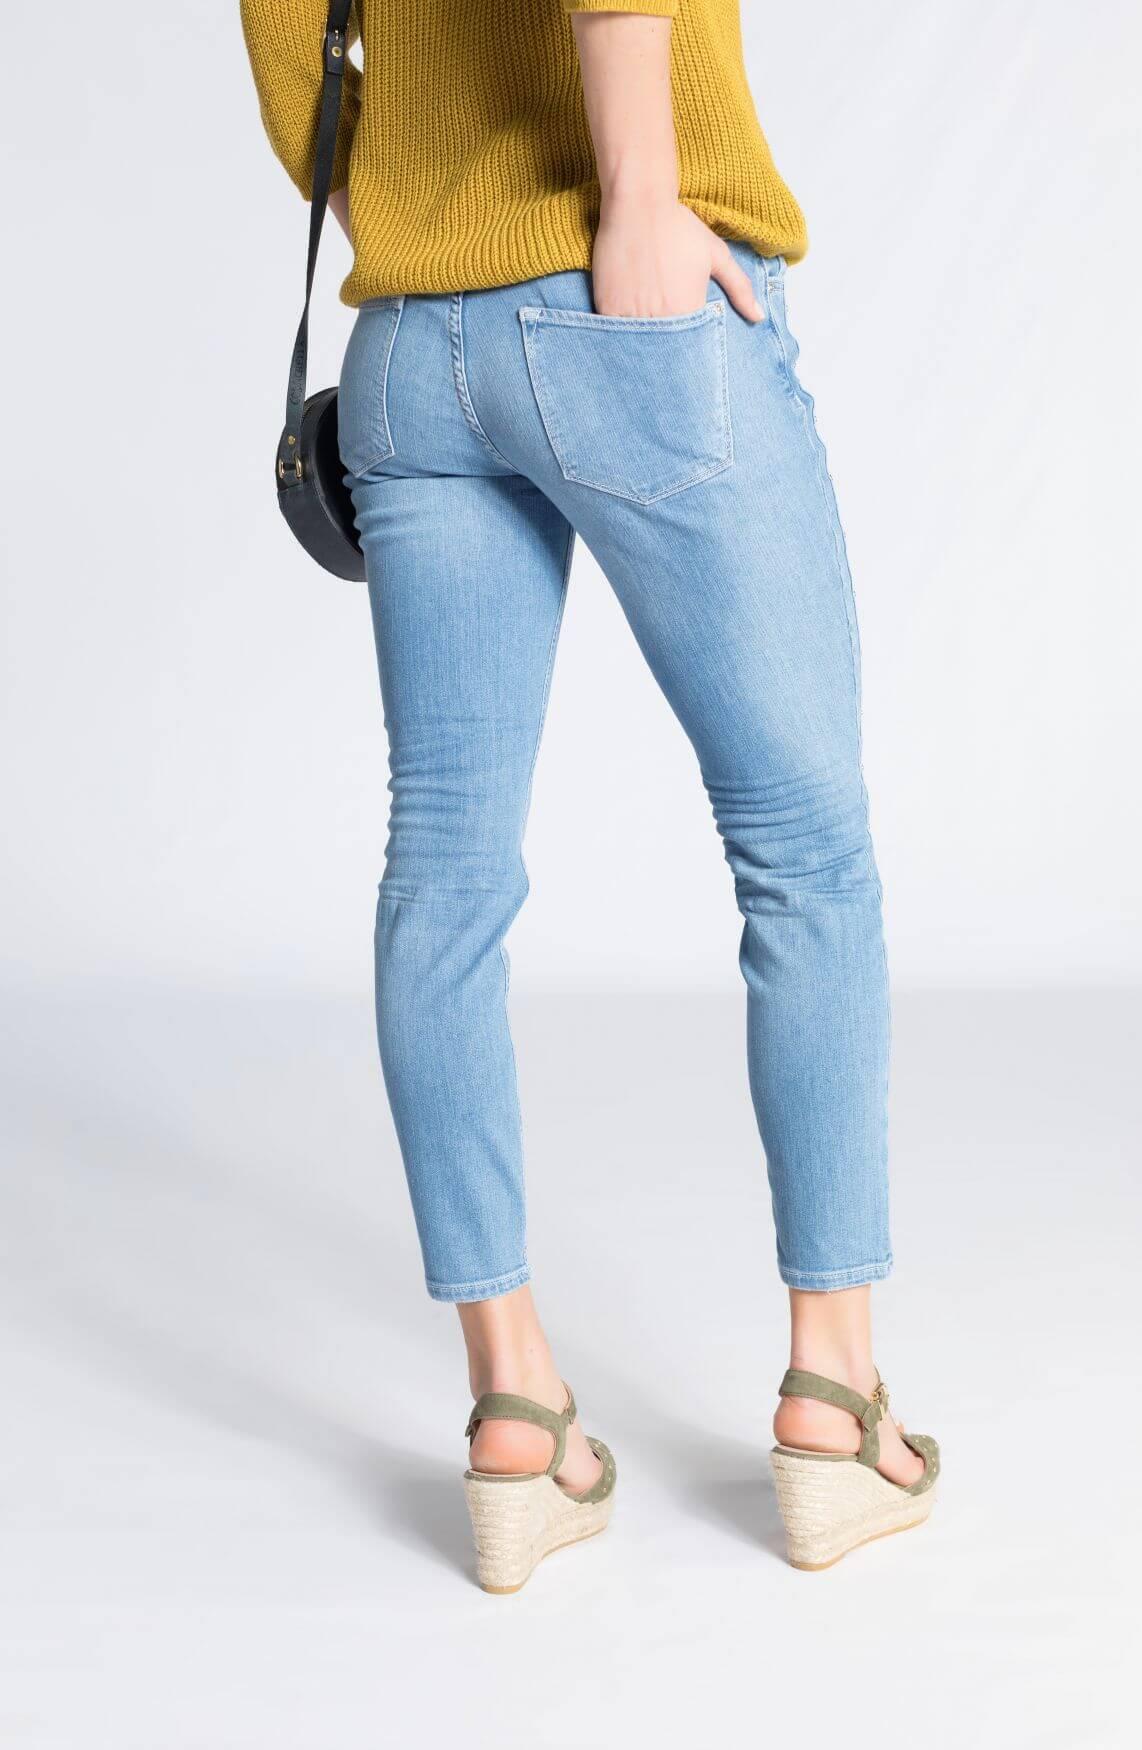 Rosner Dames Antonia jeans met studs